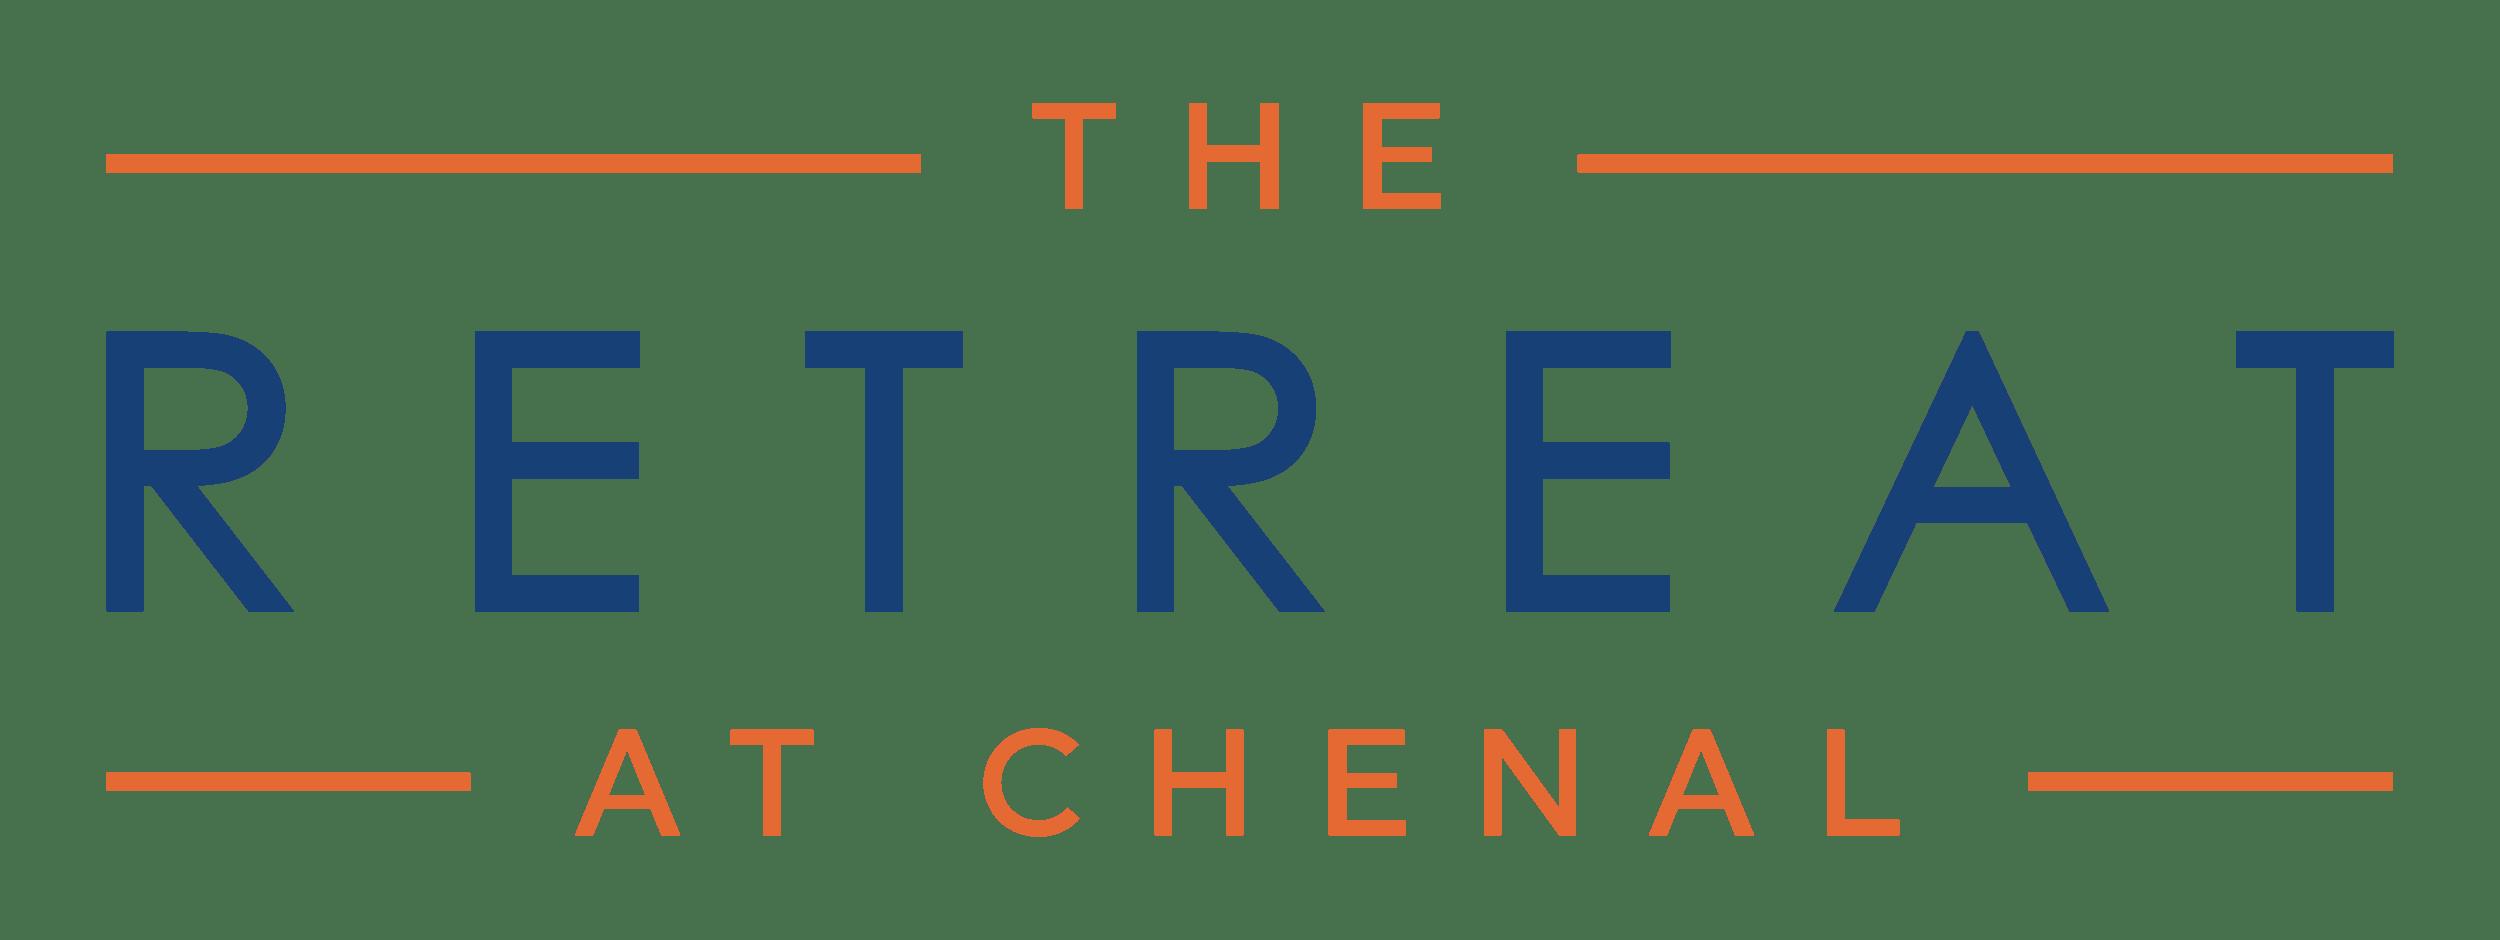 The Retreat at Chenal